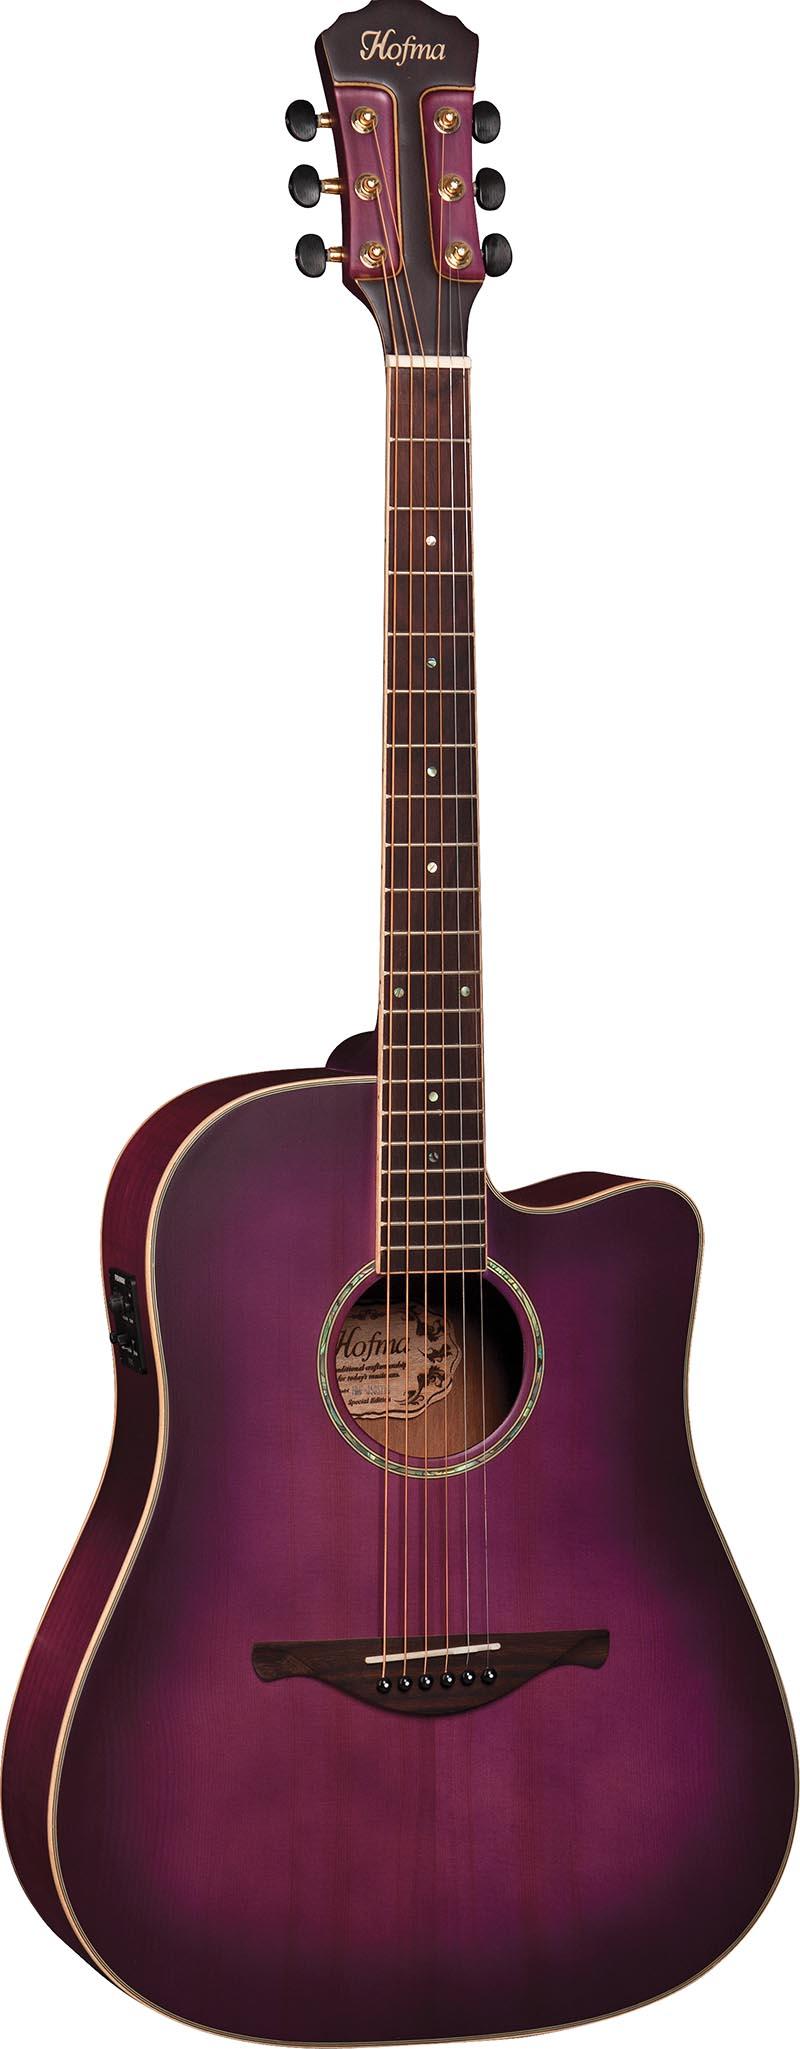 hmp350 violao folk dreadnought eletroacustico tampo solido hofma hmp350 stvs violeta acetinado visao frontal vertical